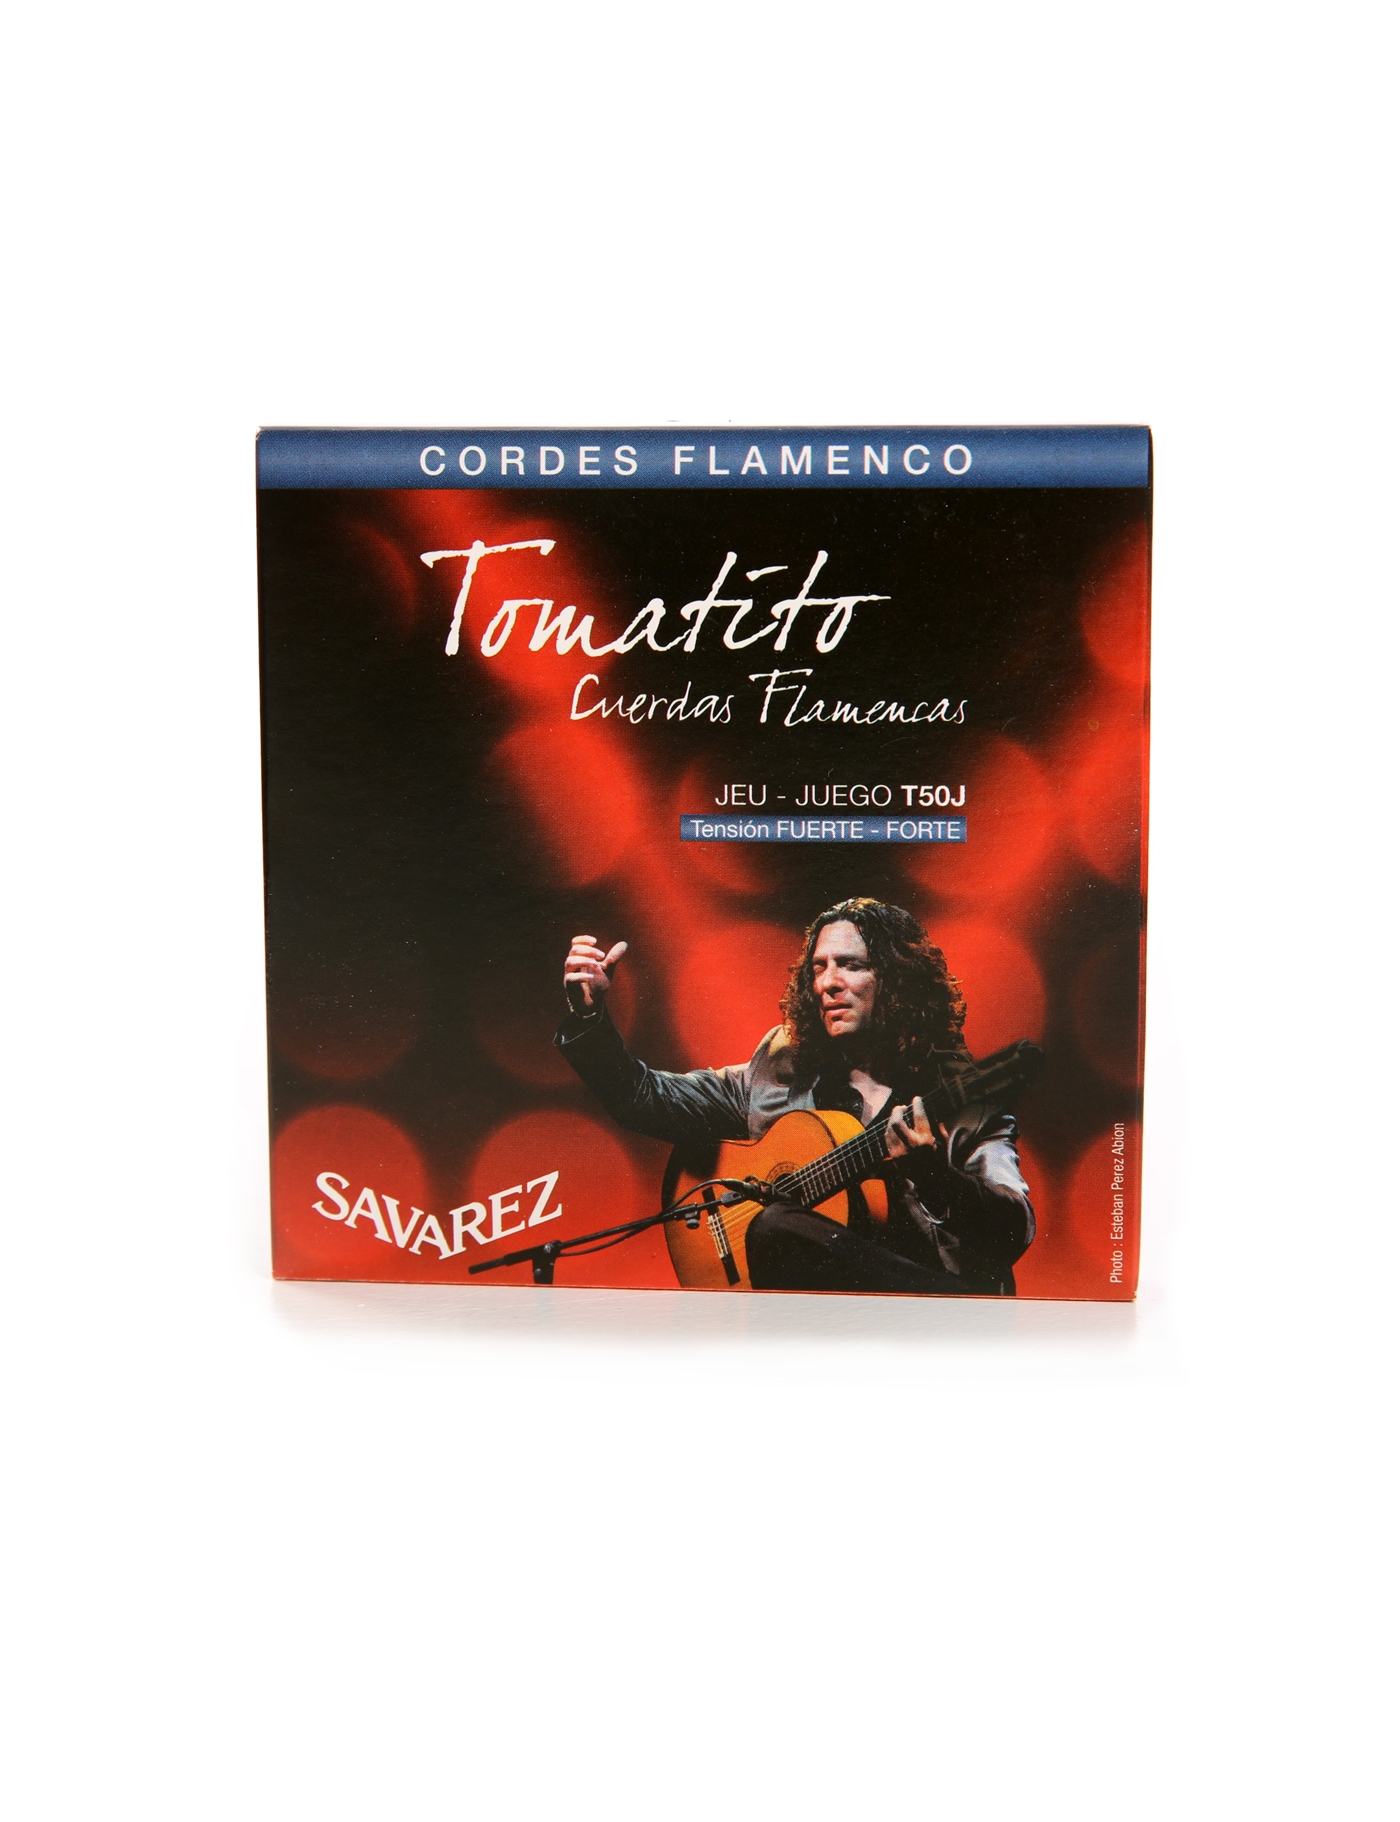 flamenco guitar strings tomatito hard tension t50j strings la sonanta flamenco. Black Bedroom Furniture Sets. Home Design Ideas